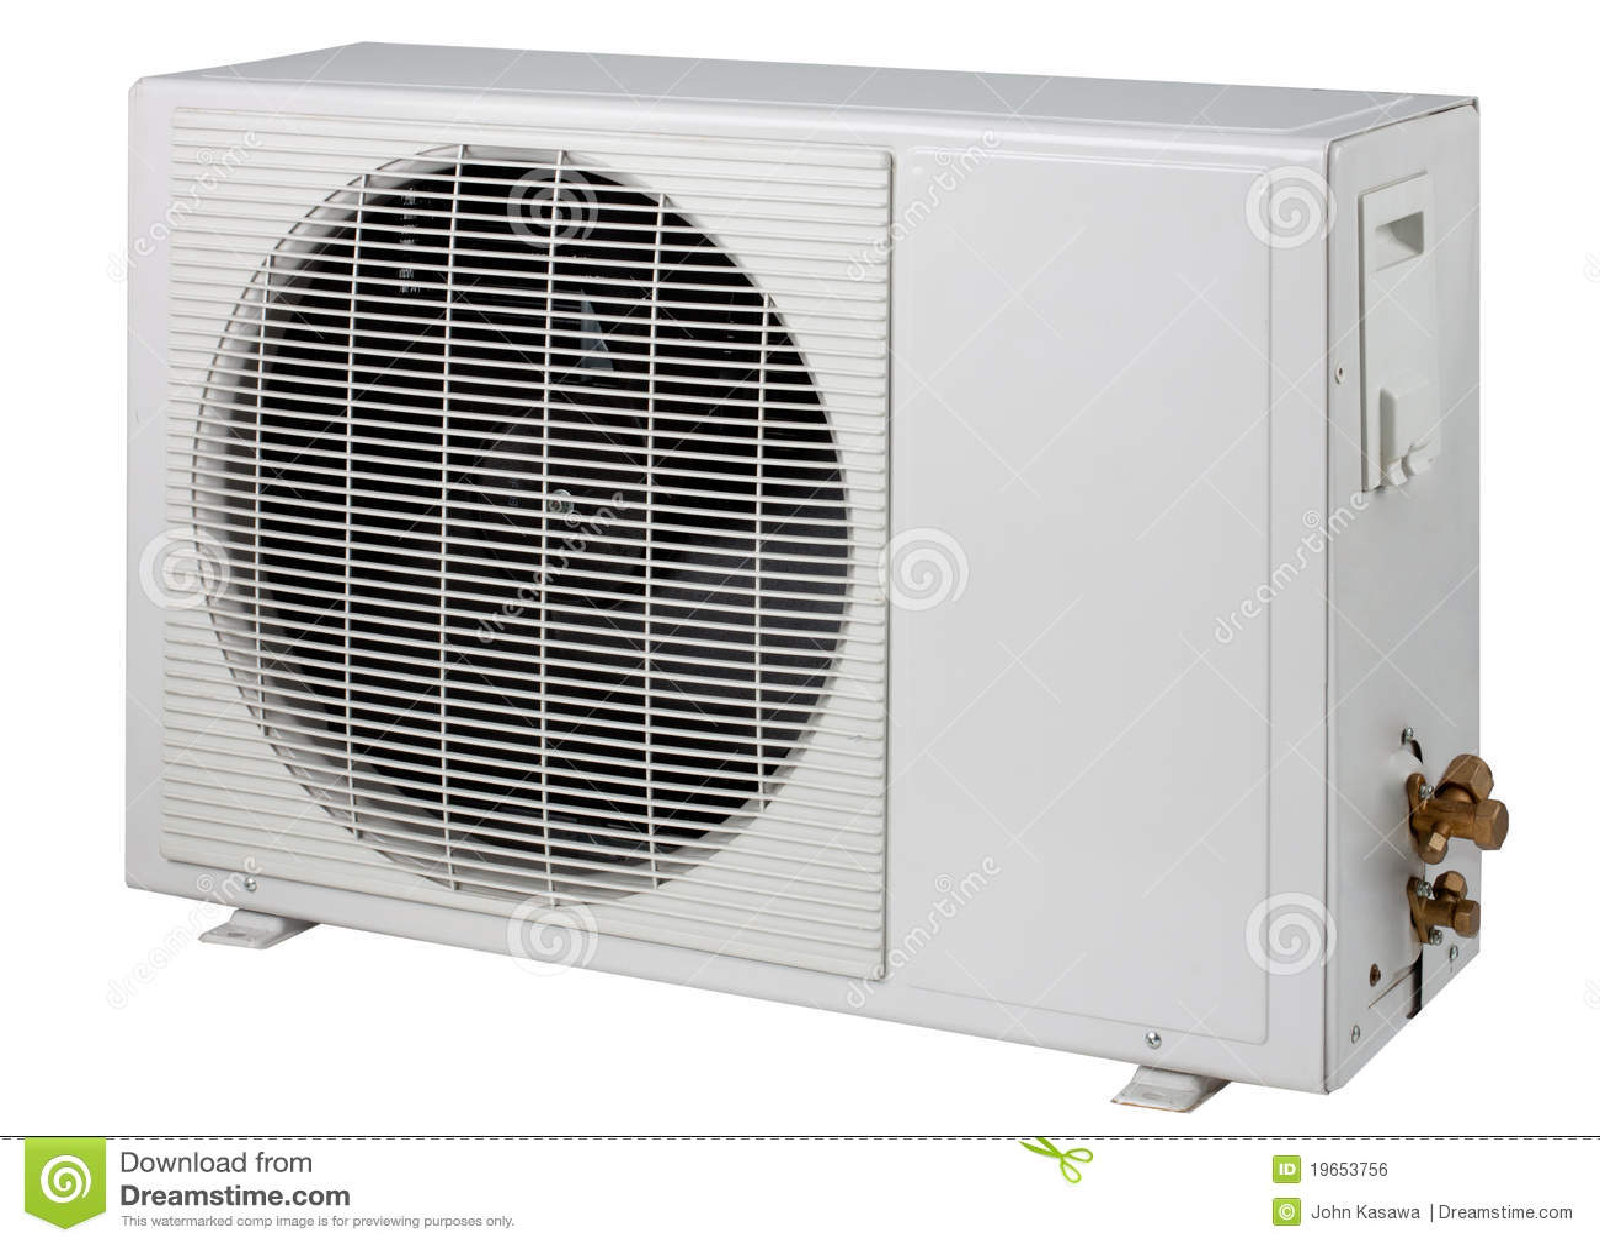 Condenser Air Air conditioner condensing #84A625